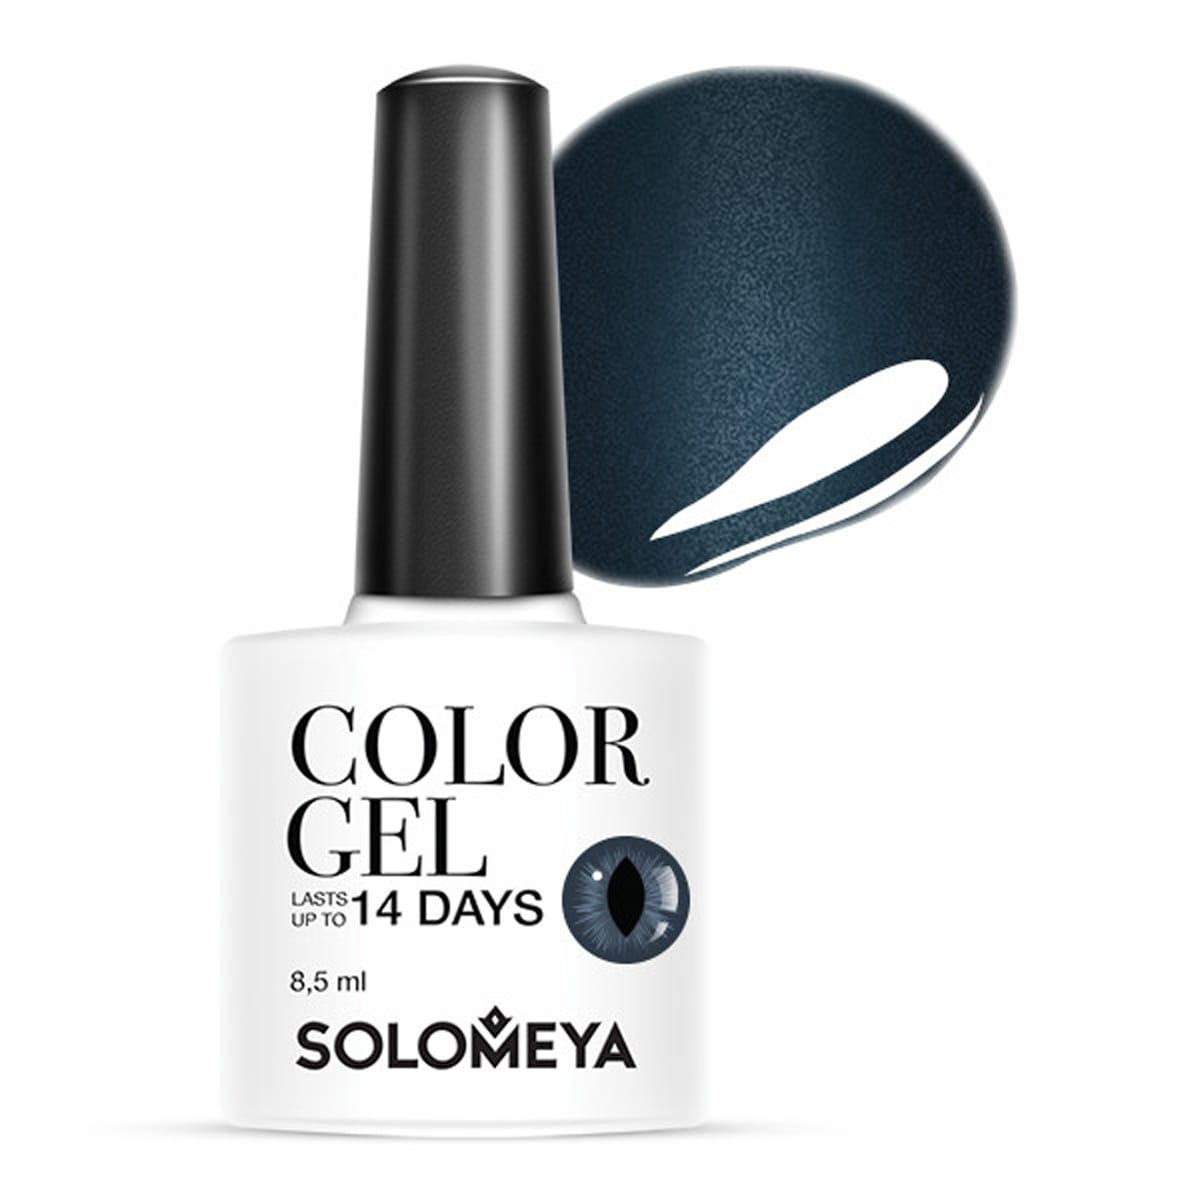 SOLOMEYA Гель-лак для ногтей SCE027 Кошачий глаз, сумеречный синий / Cat Eye Gel Dusky Blue 8,5 мл цена